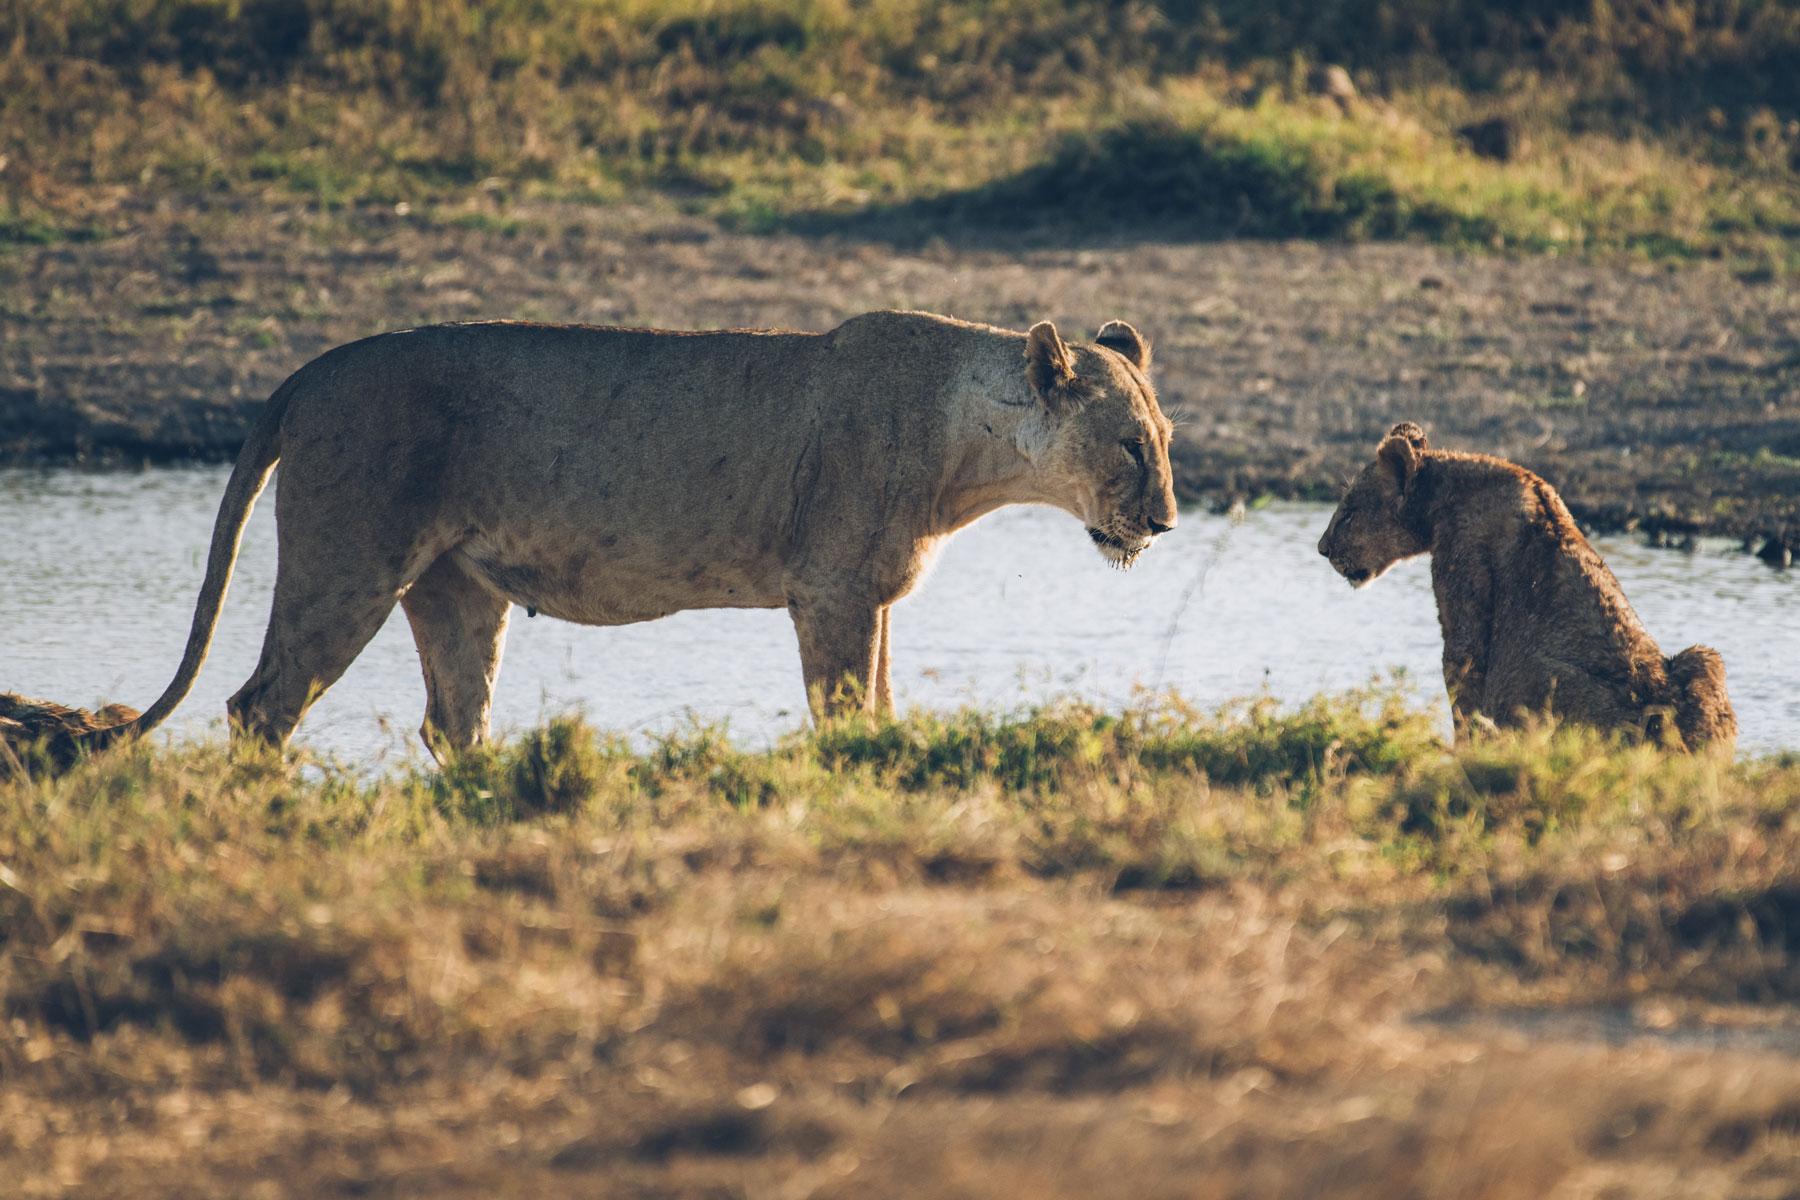 Lions, Parc National Amboseli, Kenya